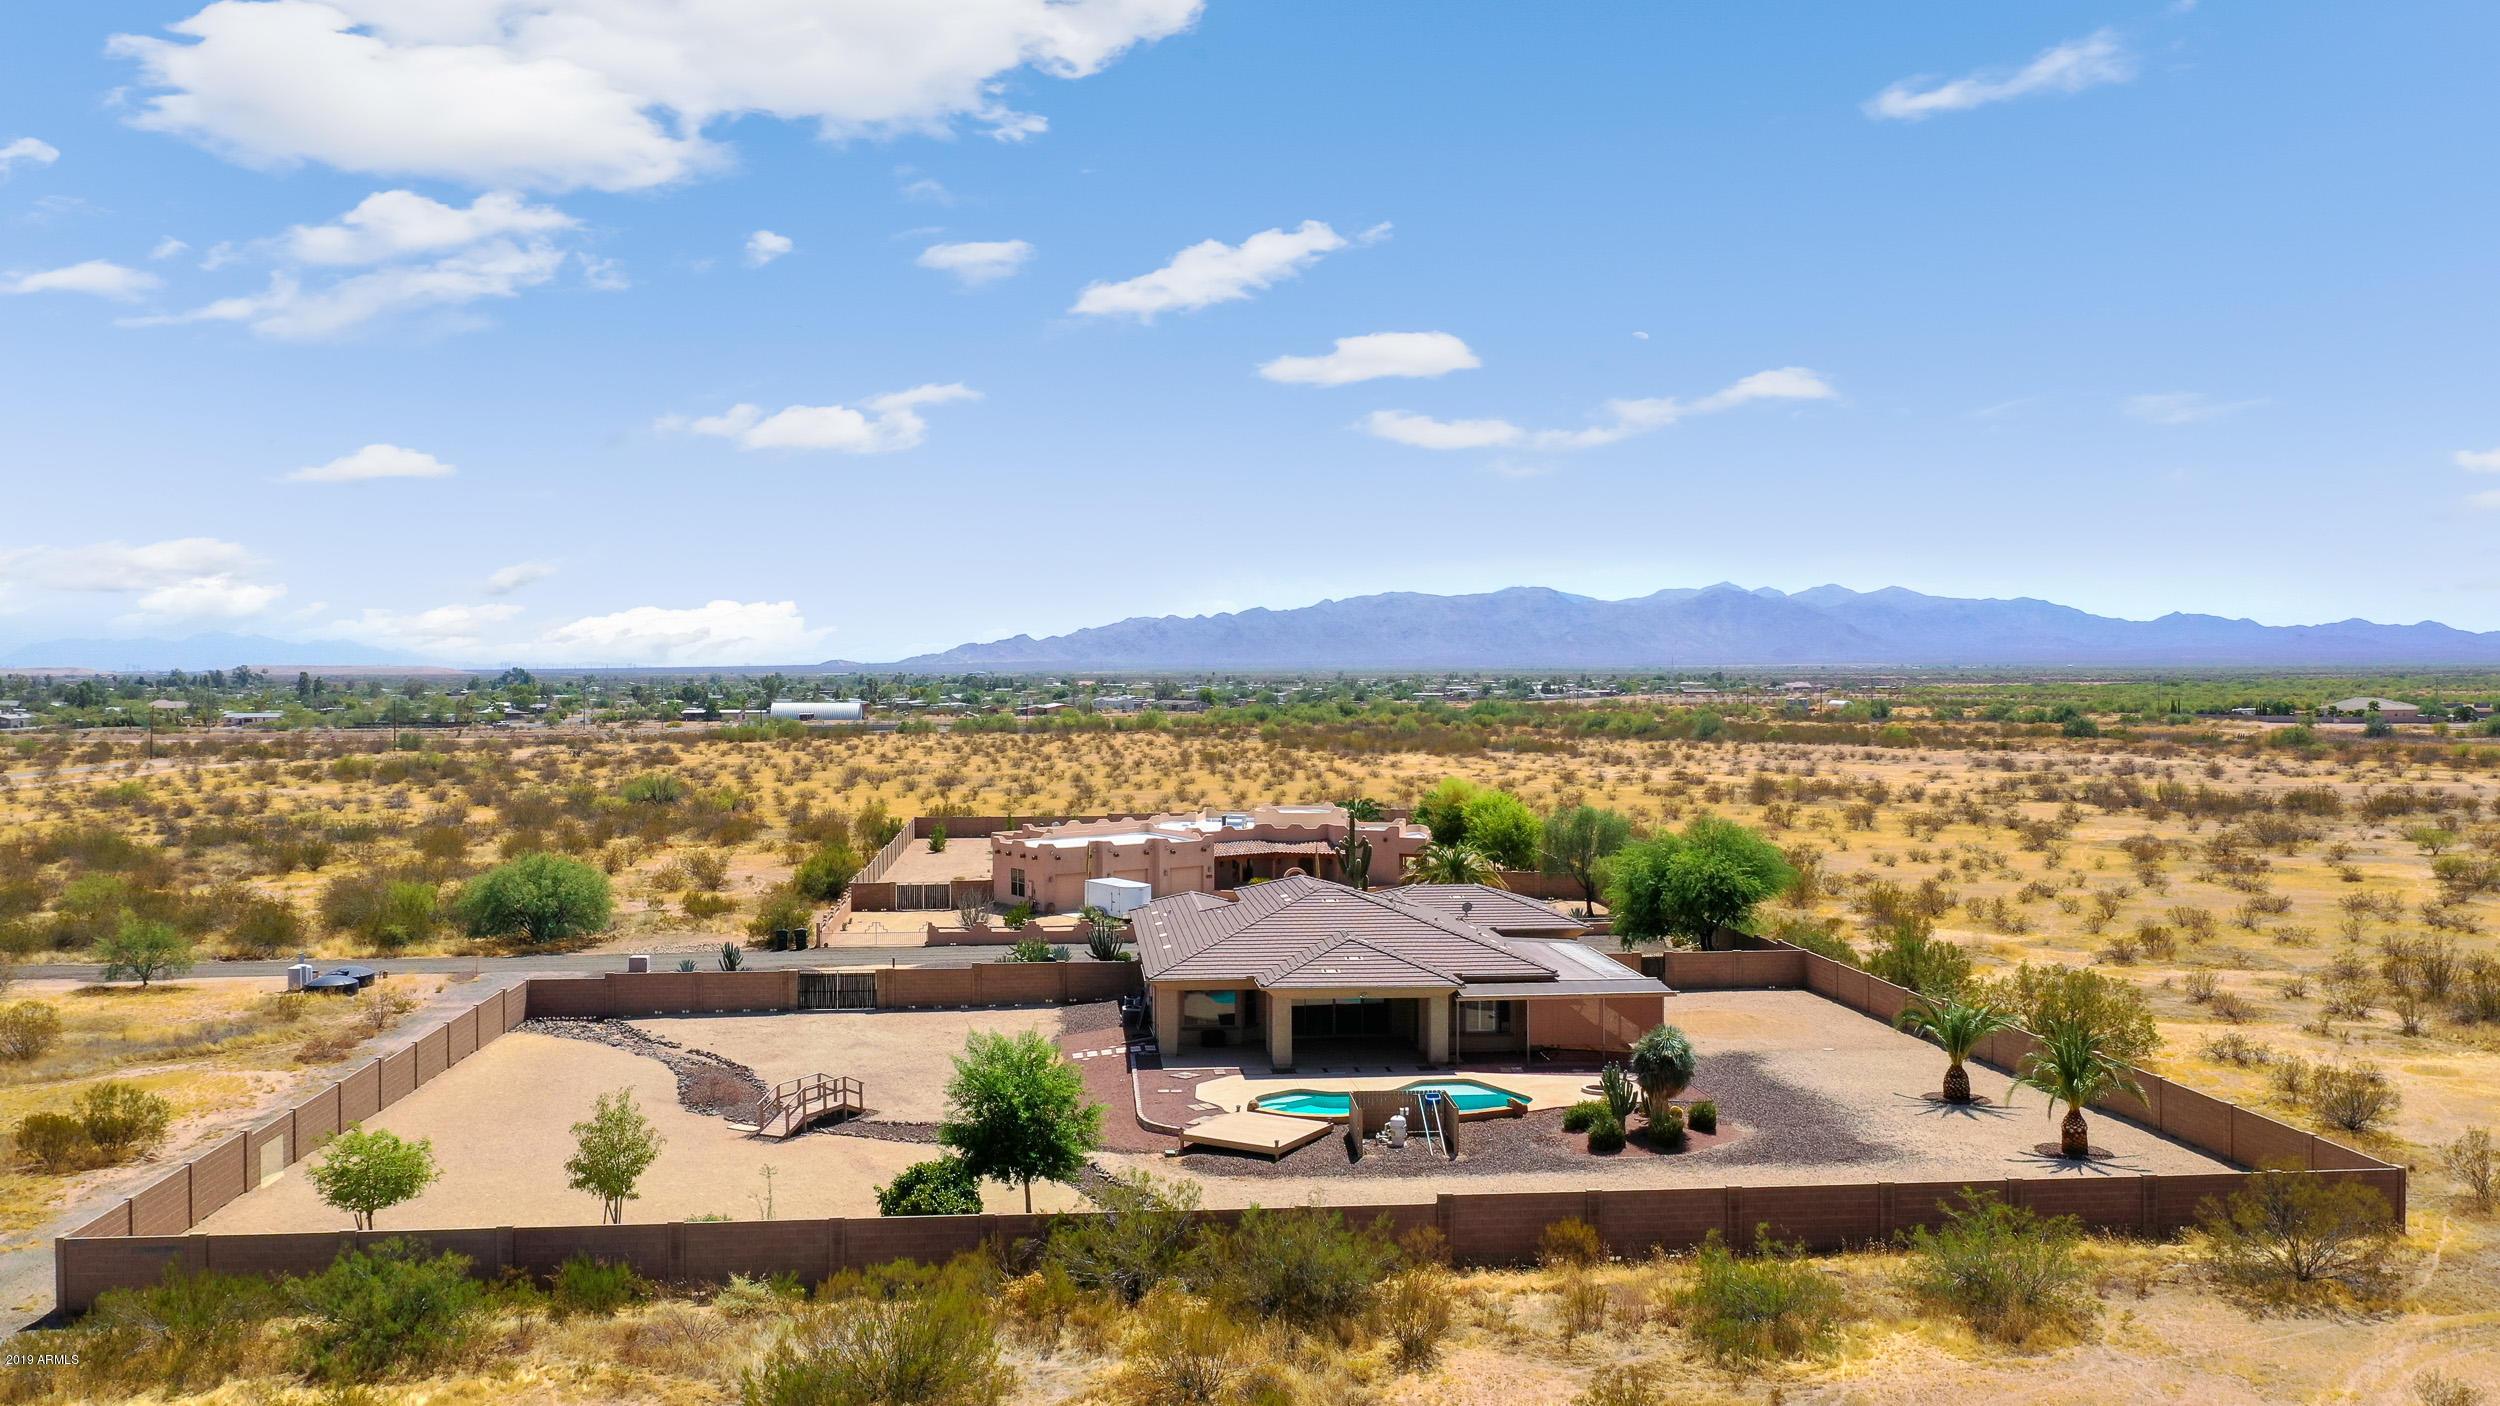 Photo of 20740 W MADRE DEL ORO Drive, Wittmann, AZ 85361